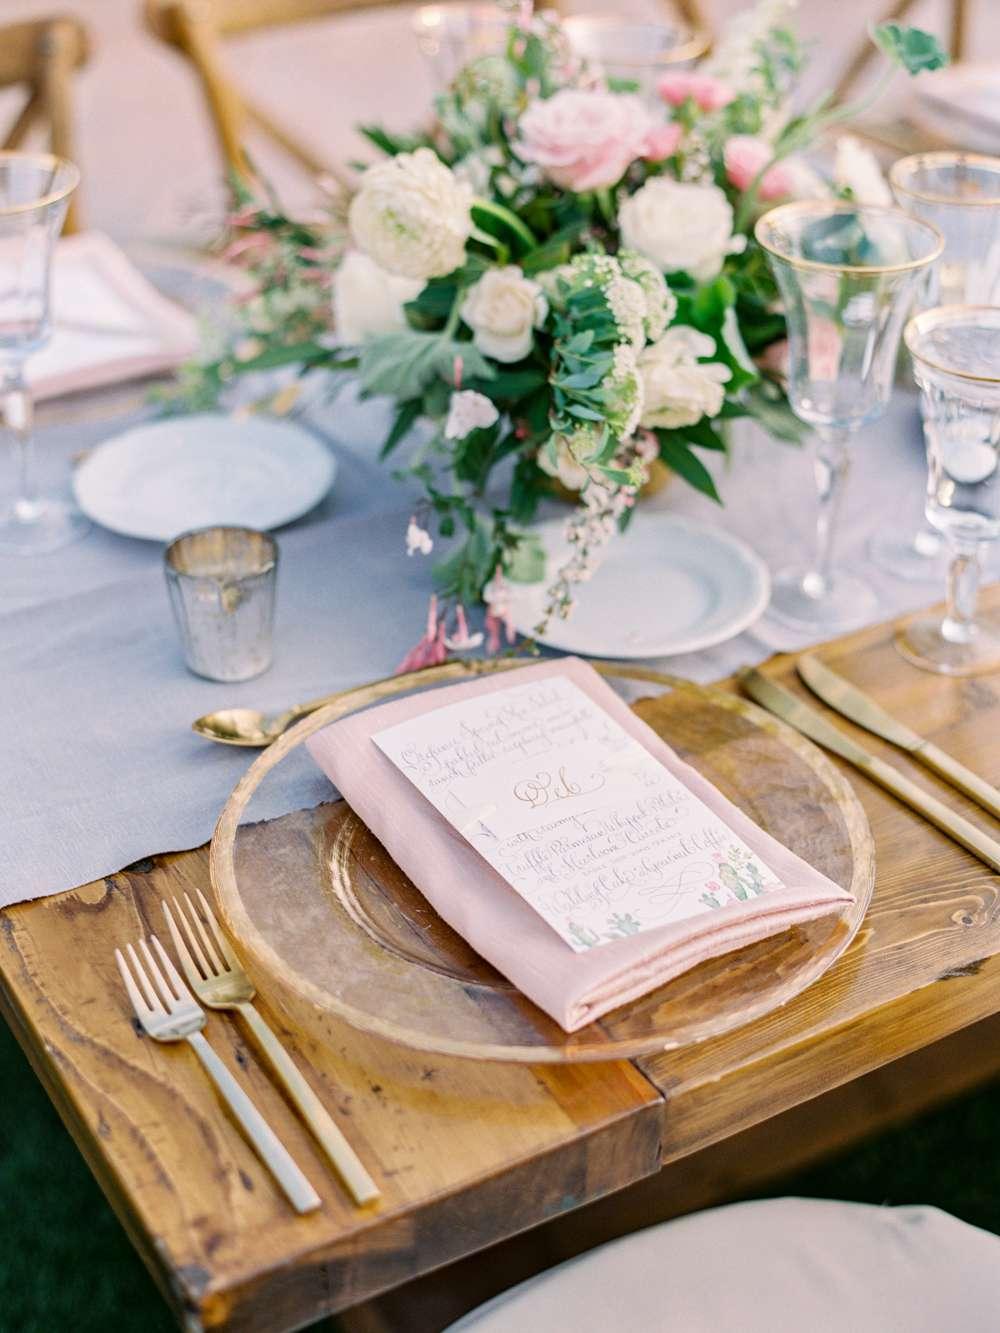 Pink napkin on a table setup